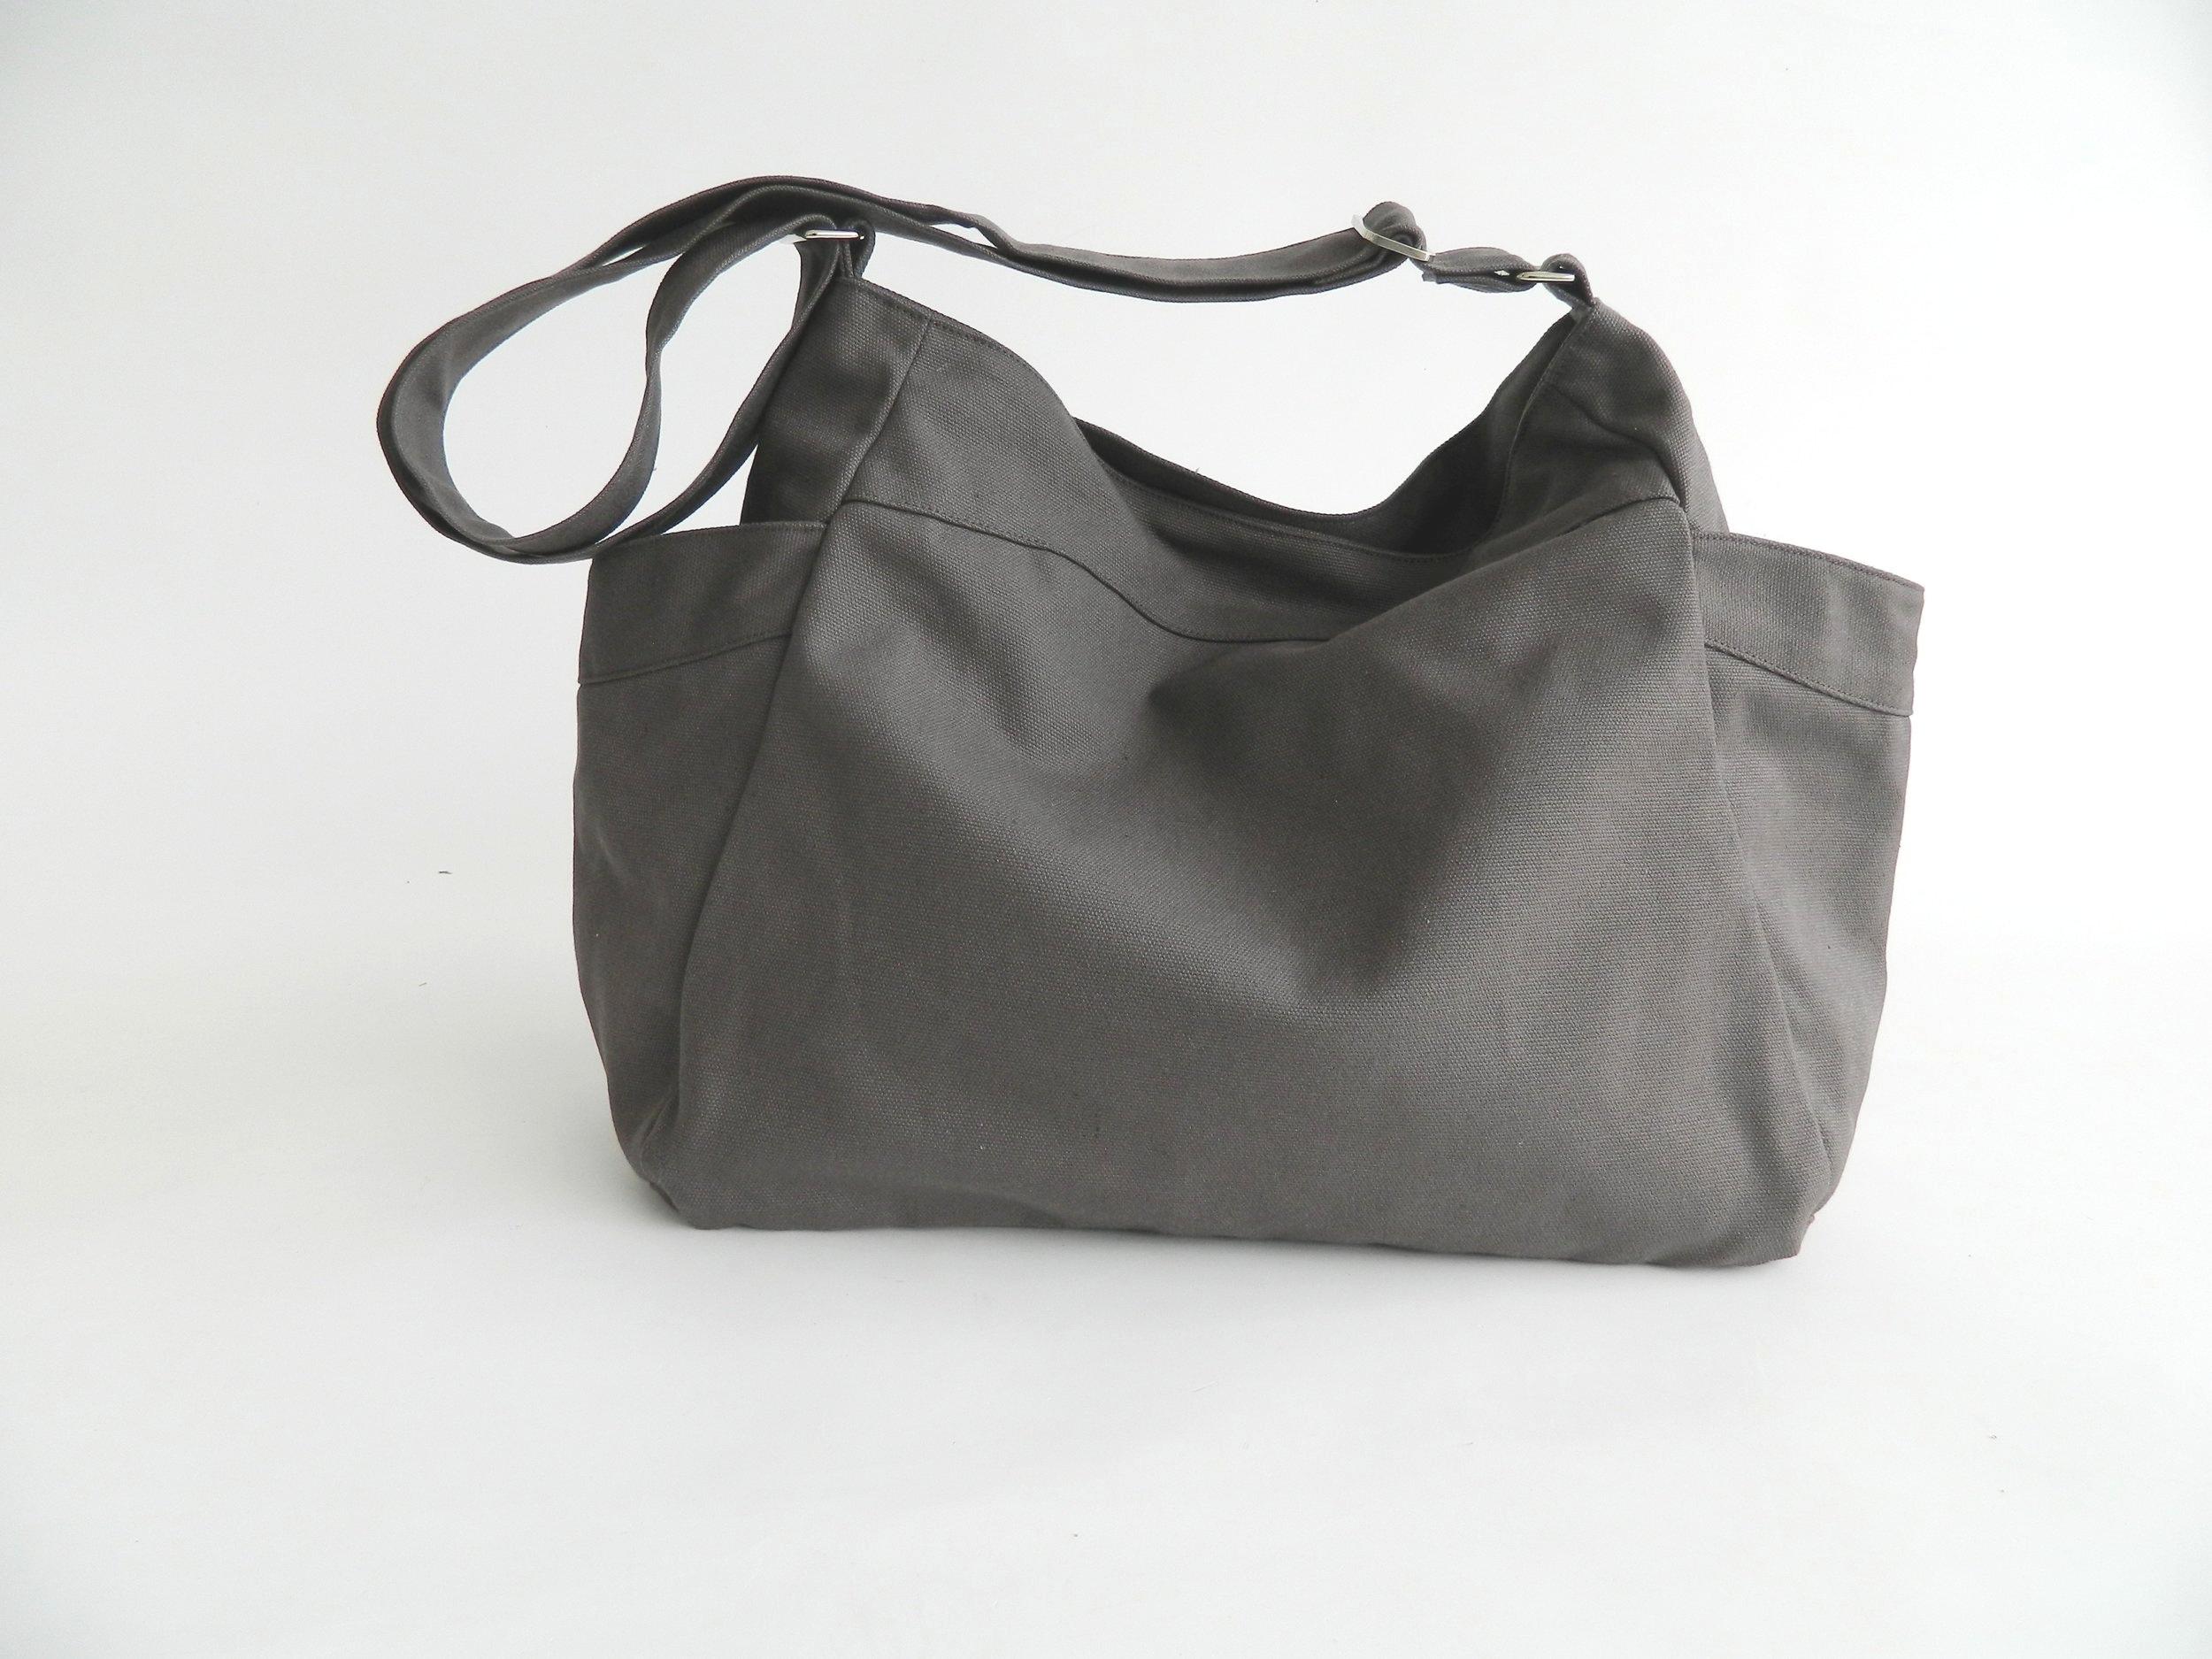 8d11e4b8a893b RENEE 101 - Gray Hobo Diaper Bag